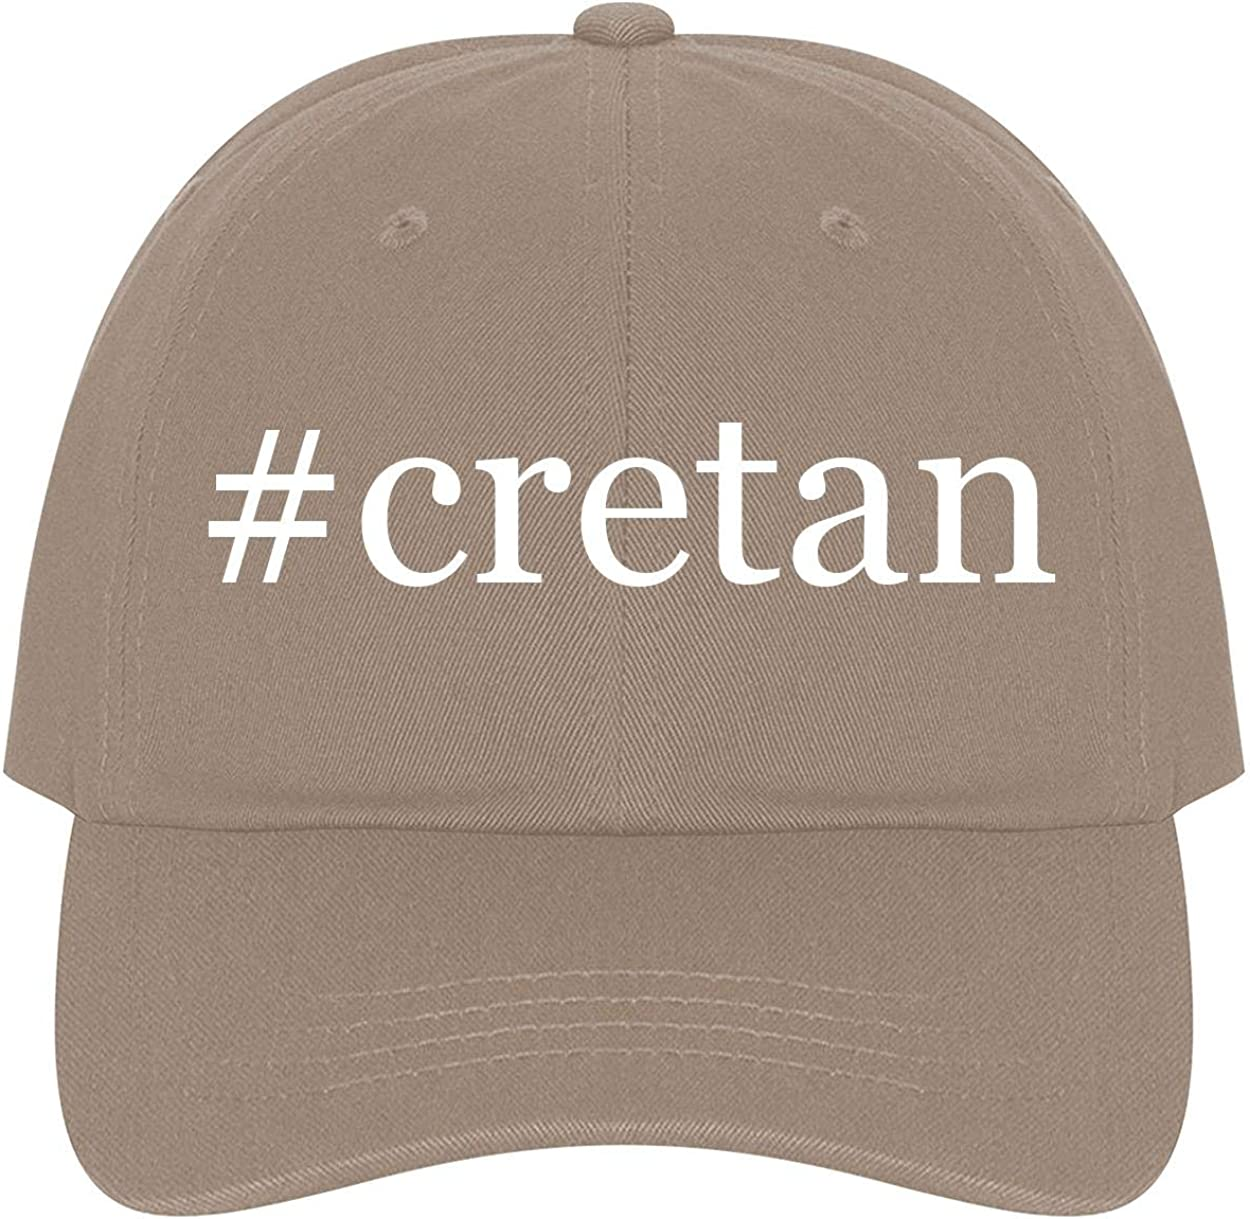 The Town Butler #Cretan A Nice Comfortable Adjustable Hashtag Dad Hat Cap